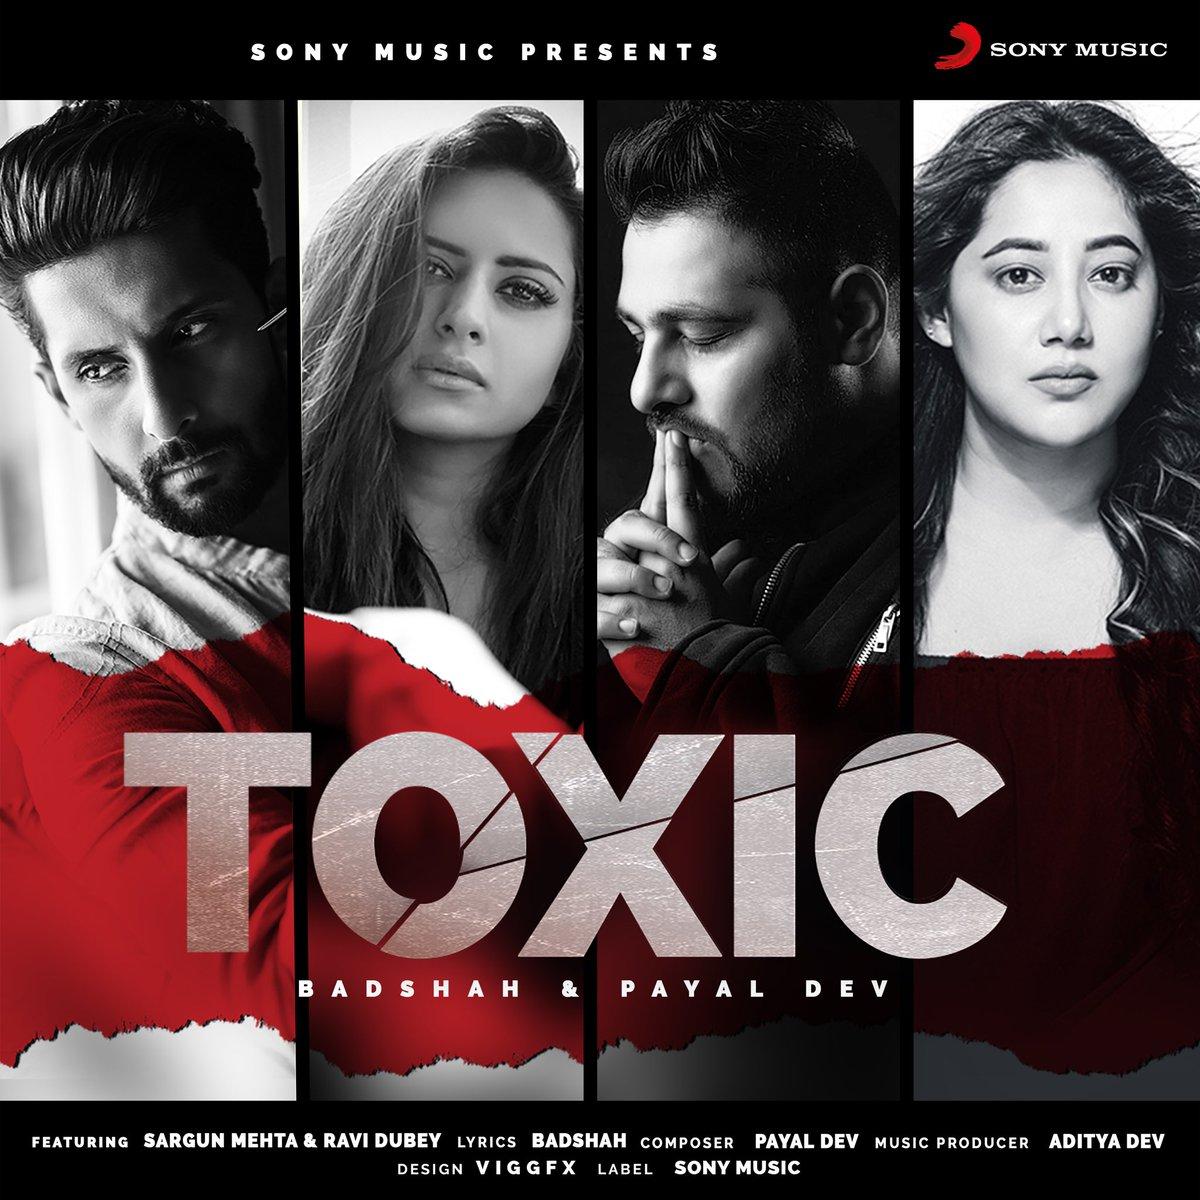 Ye pyaar kya hai? @_ravidubey @sargun_mehta @adityadevmusic @Payaldev1 @sonymusicindia @SonyMusicNorth #toxic